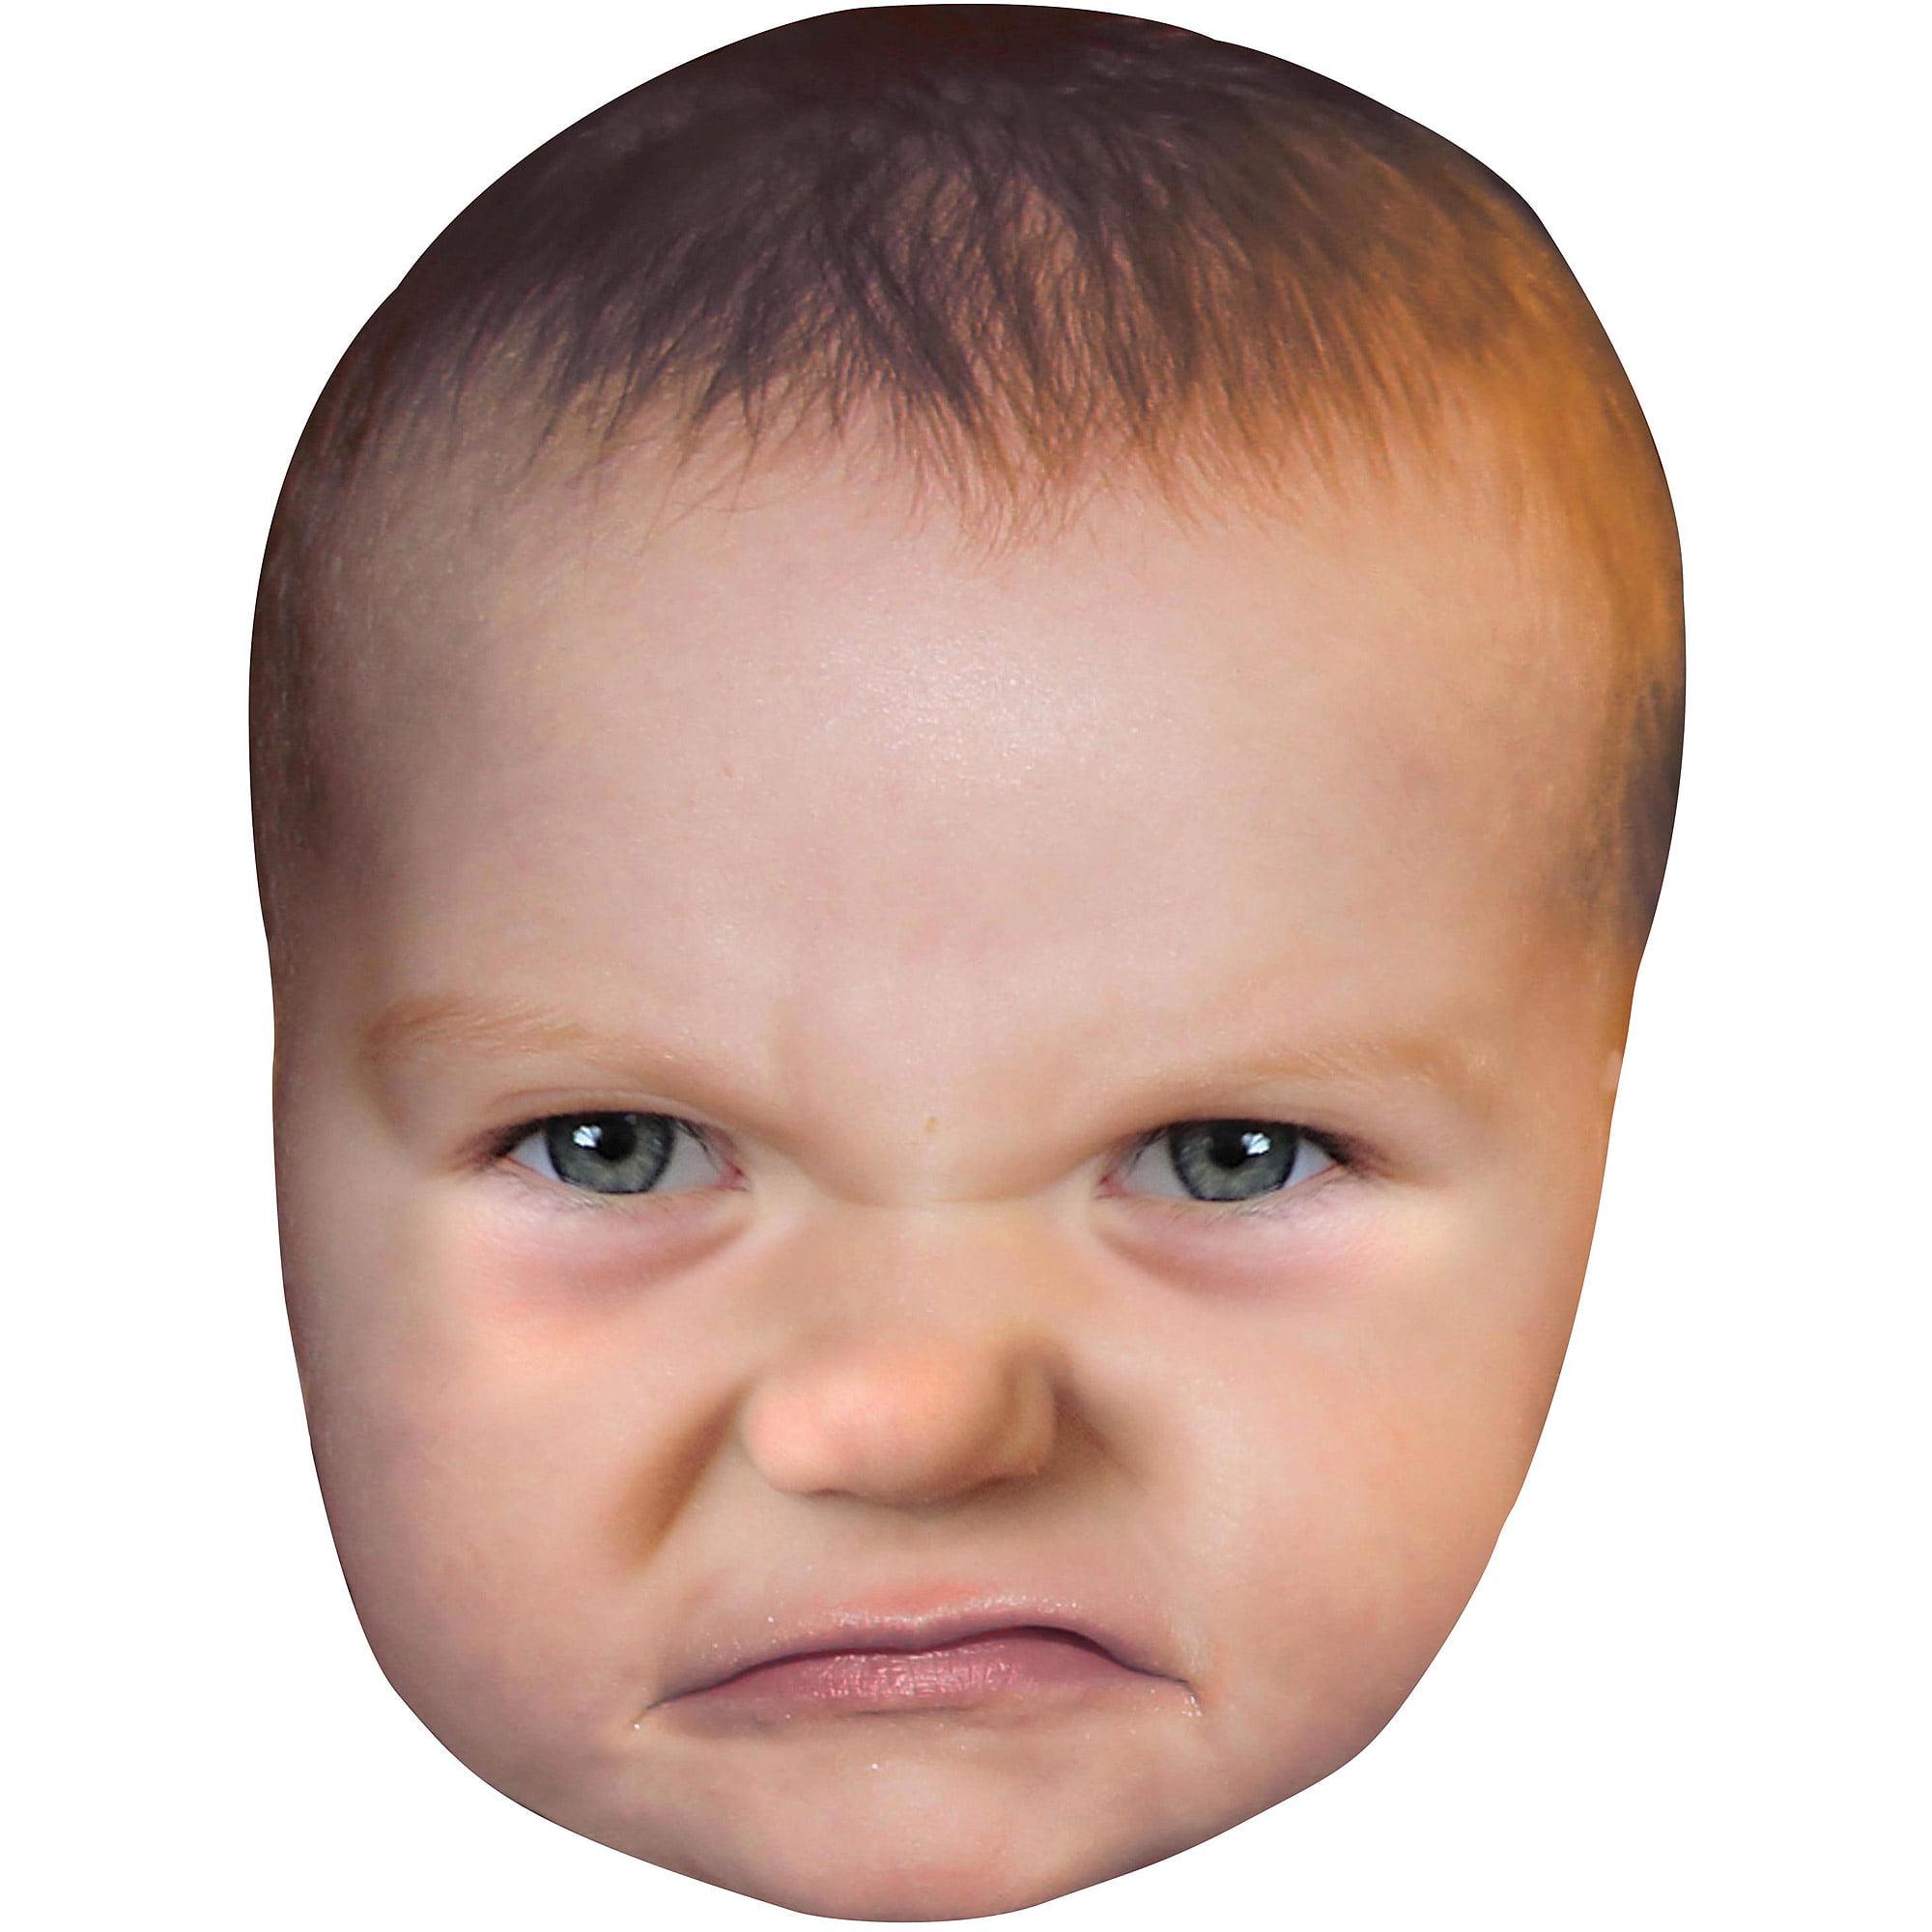 Giant Baby Head Mask Adult Halloween Accessory - Walmart ...